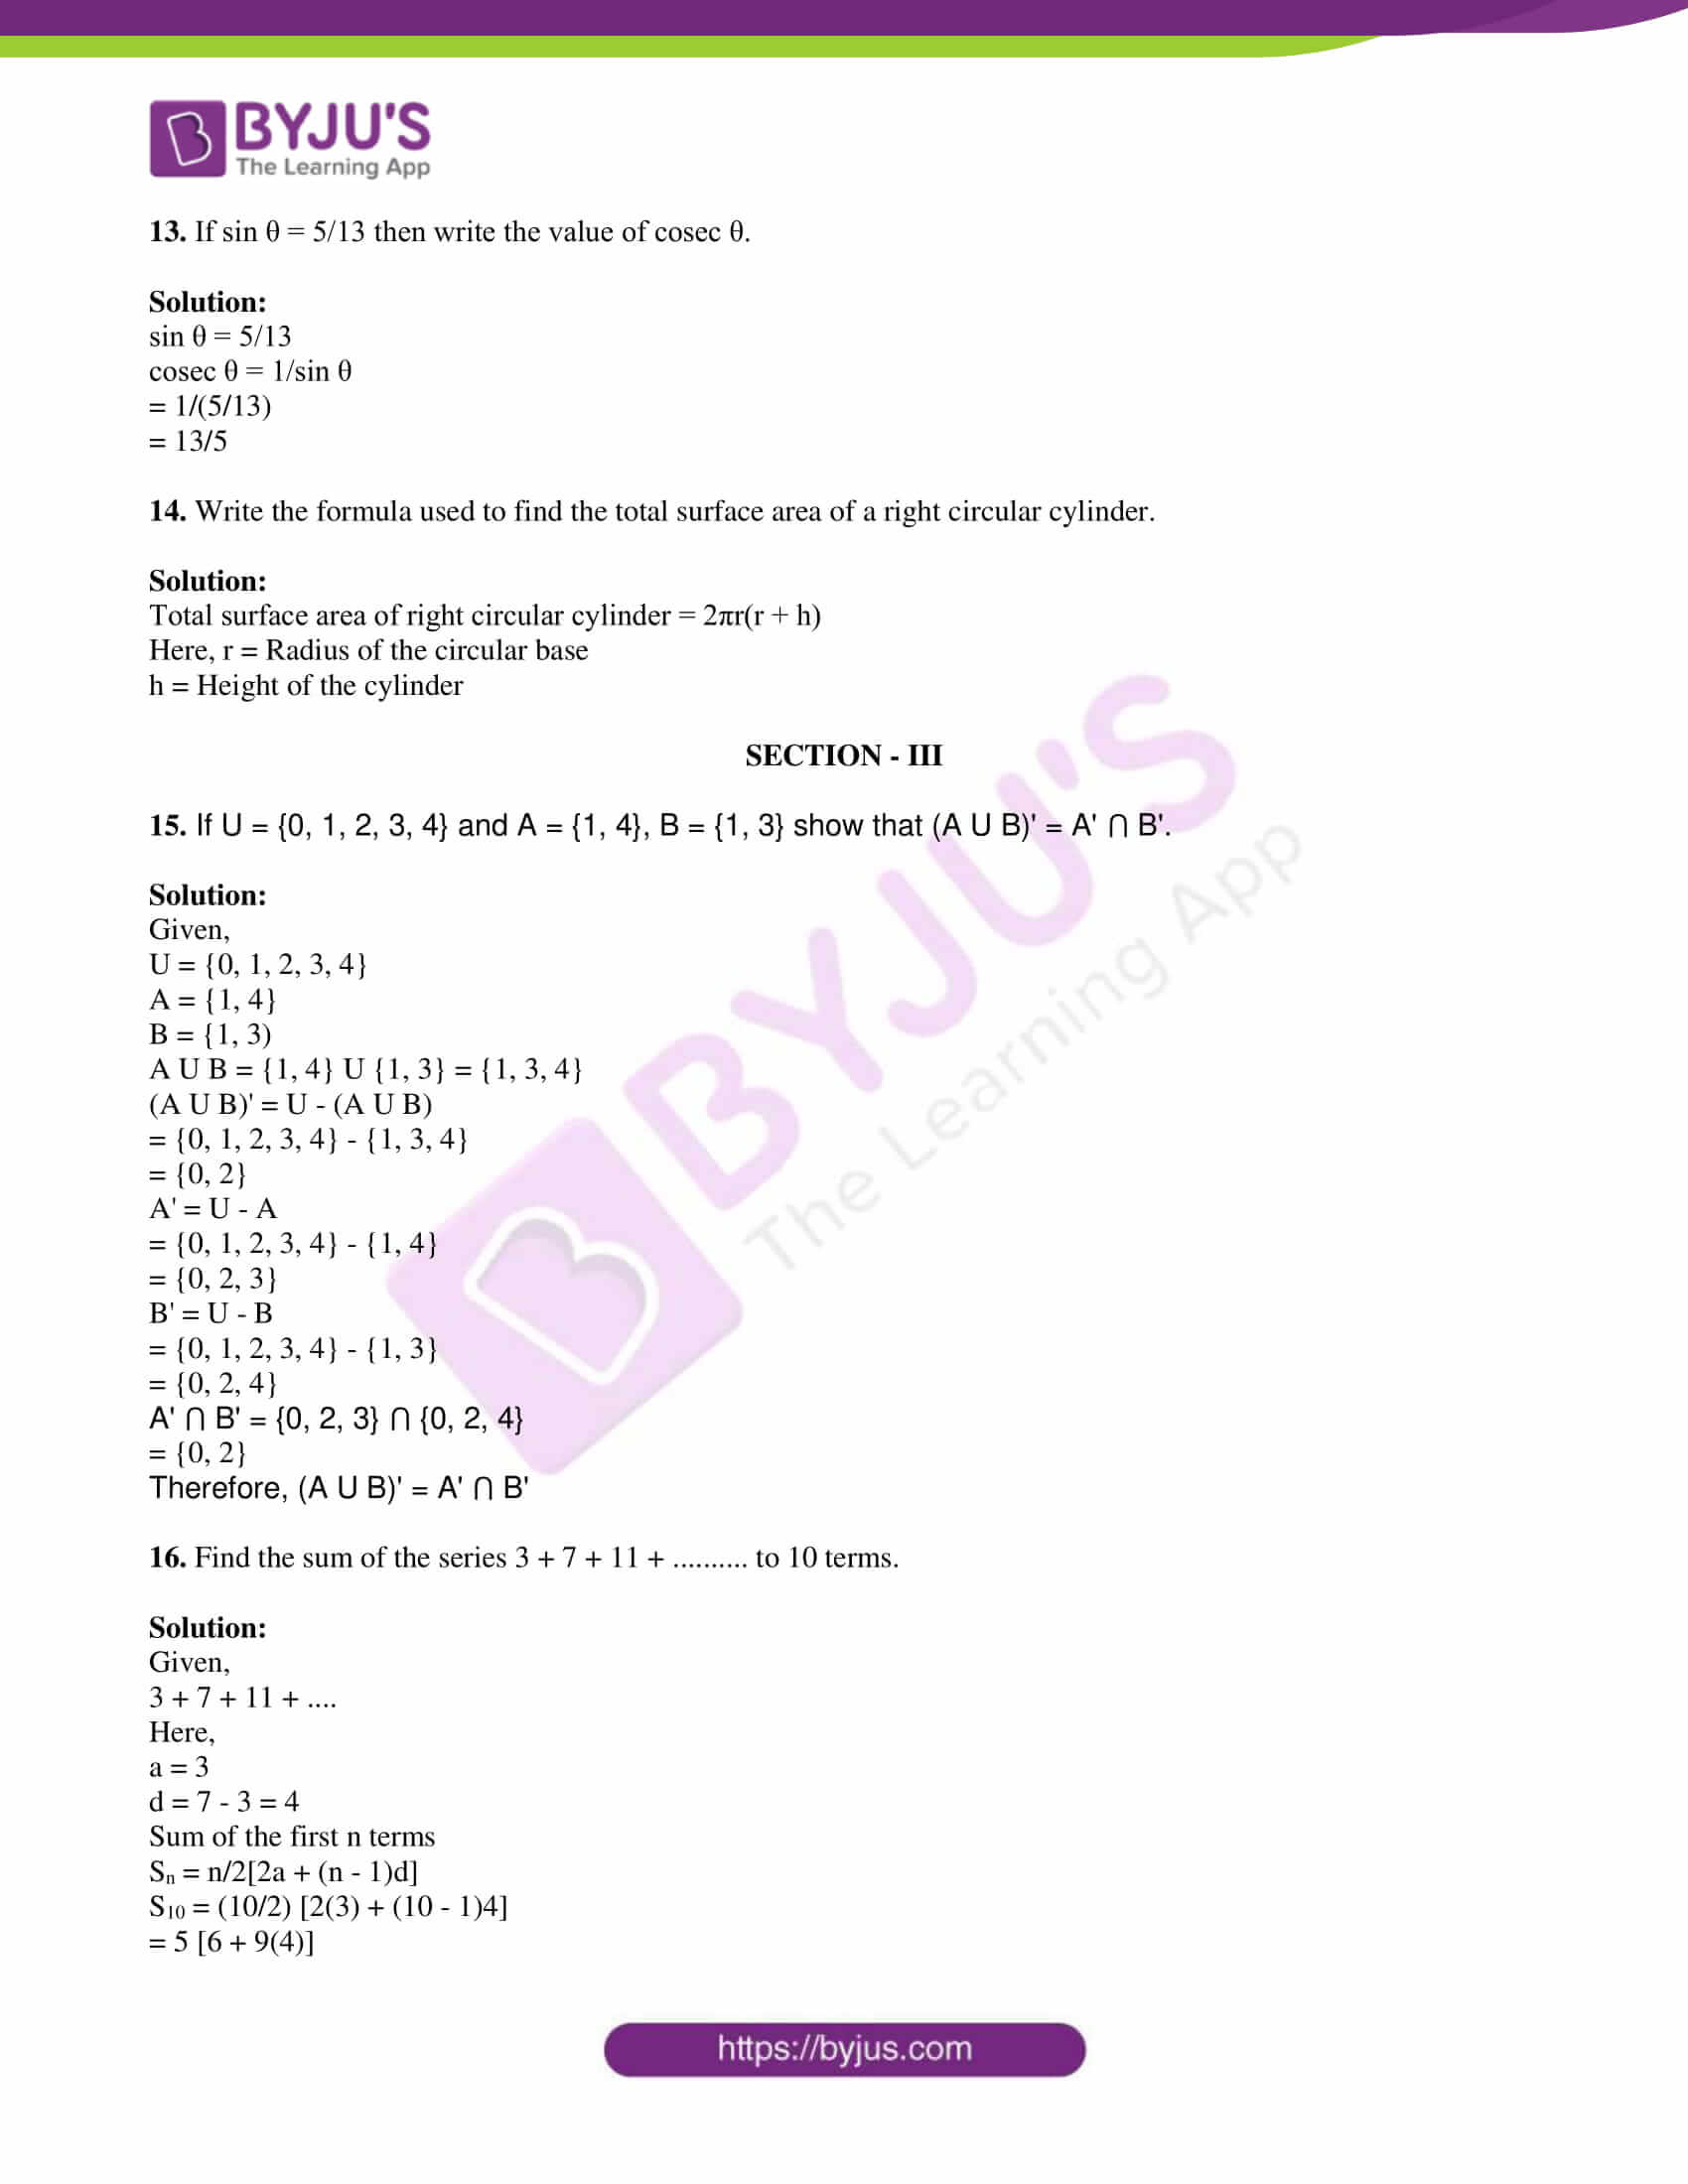 kseeb class 10 maths question paper solution 2018 05